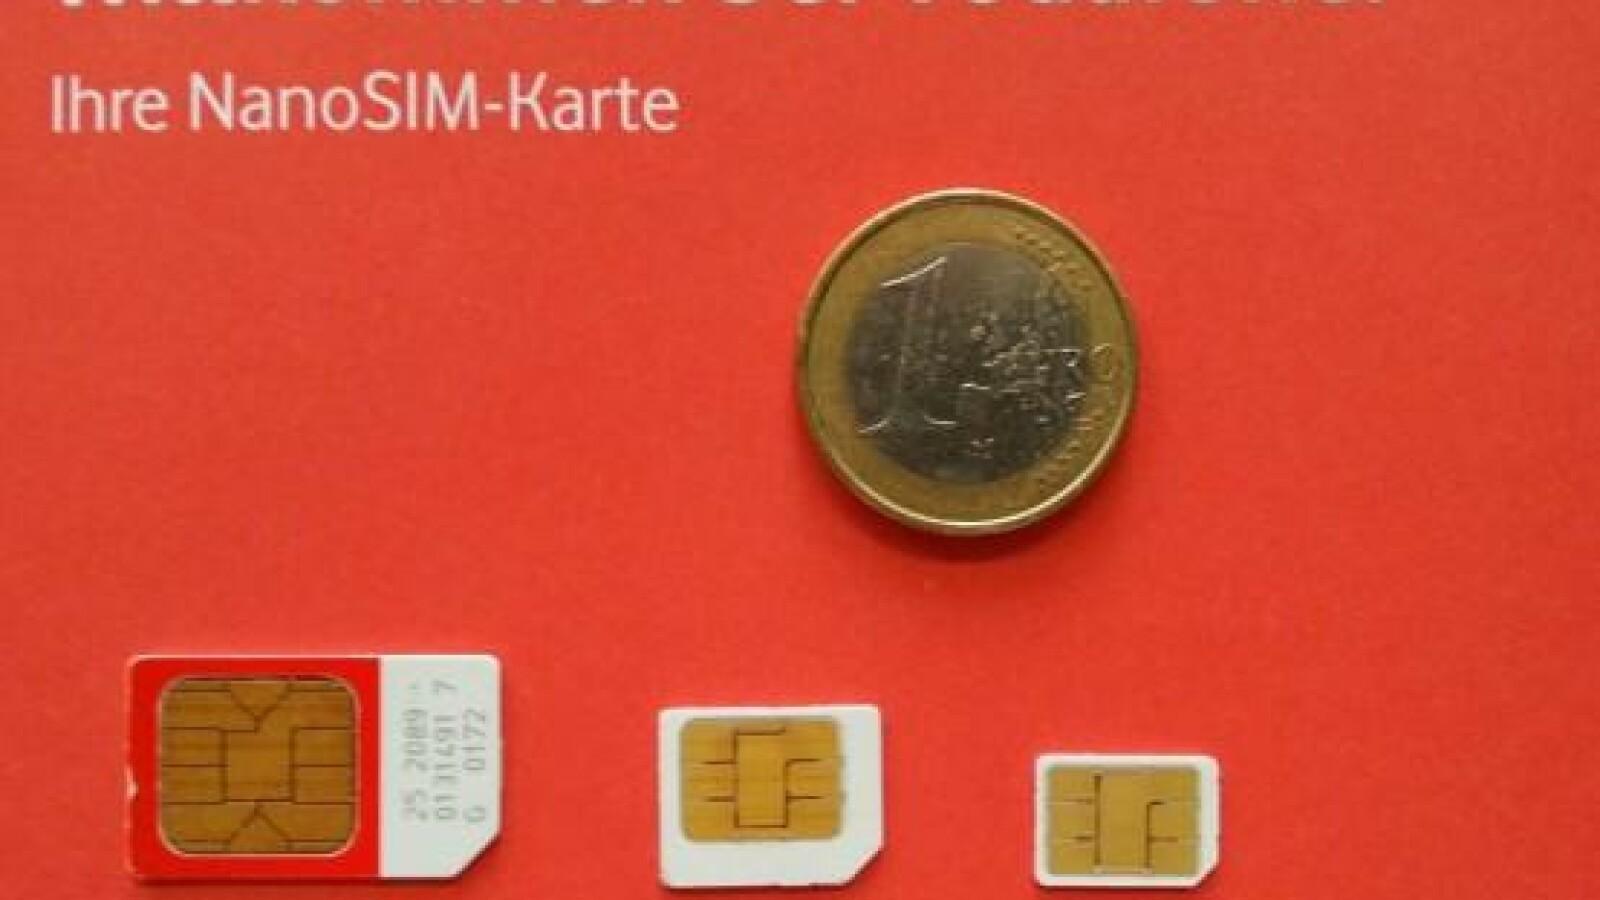 Sim Karte Mini Micro Nano Größen Im überblick Netzwelt